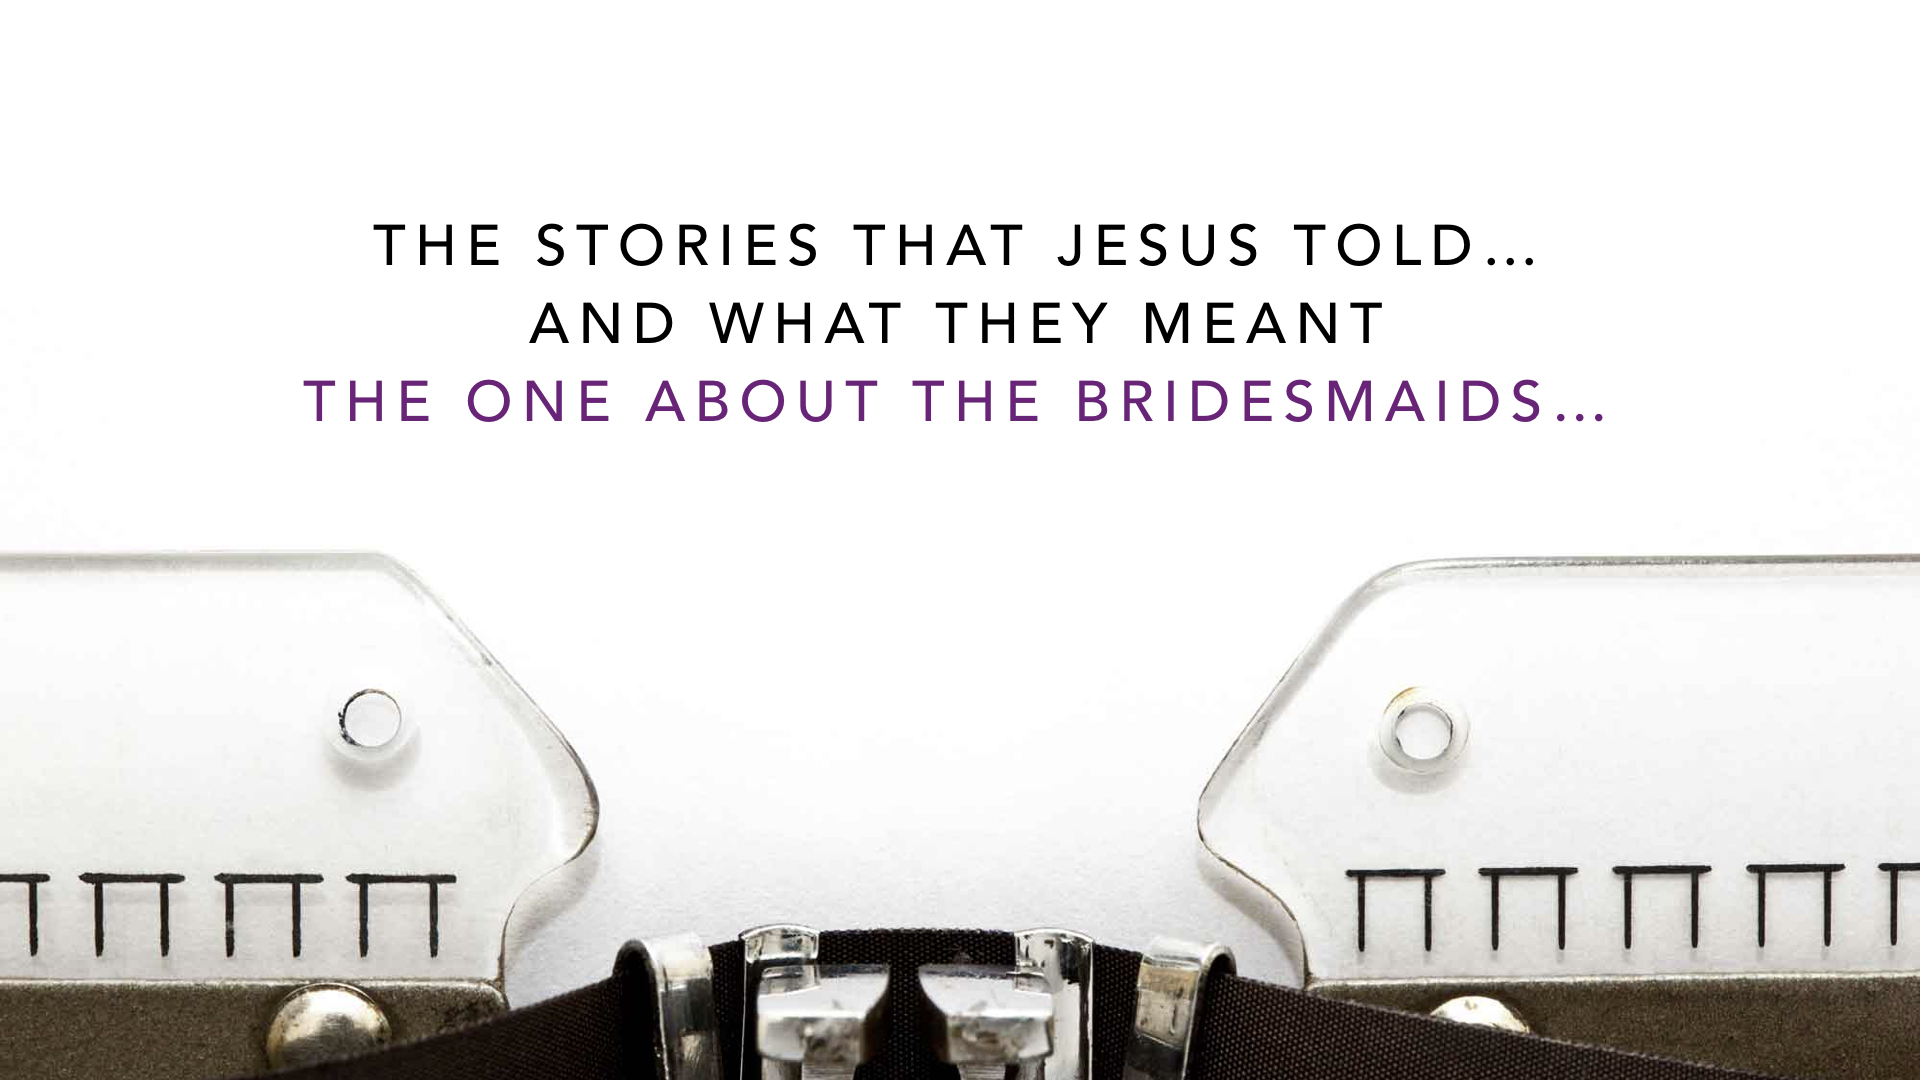 Parables - Bridesmaids & Weeds - SV - Aug 19.002.jpeg